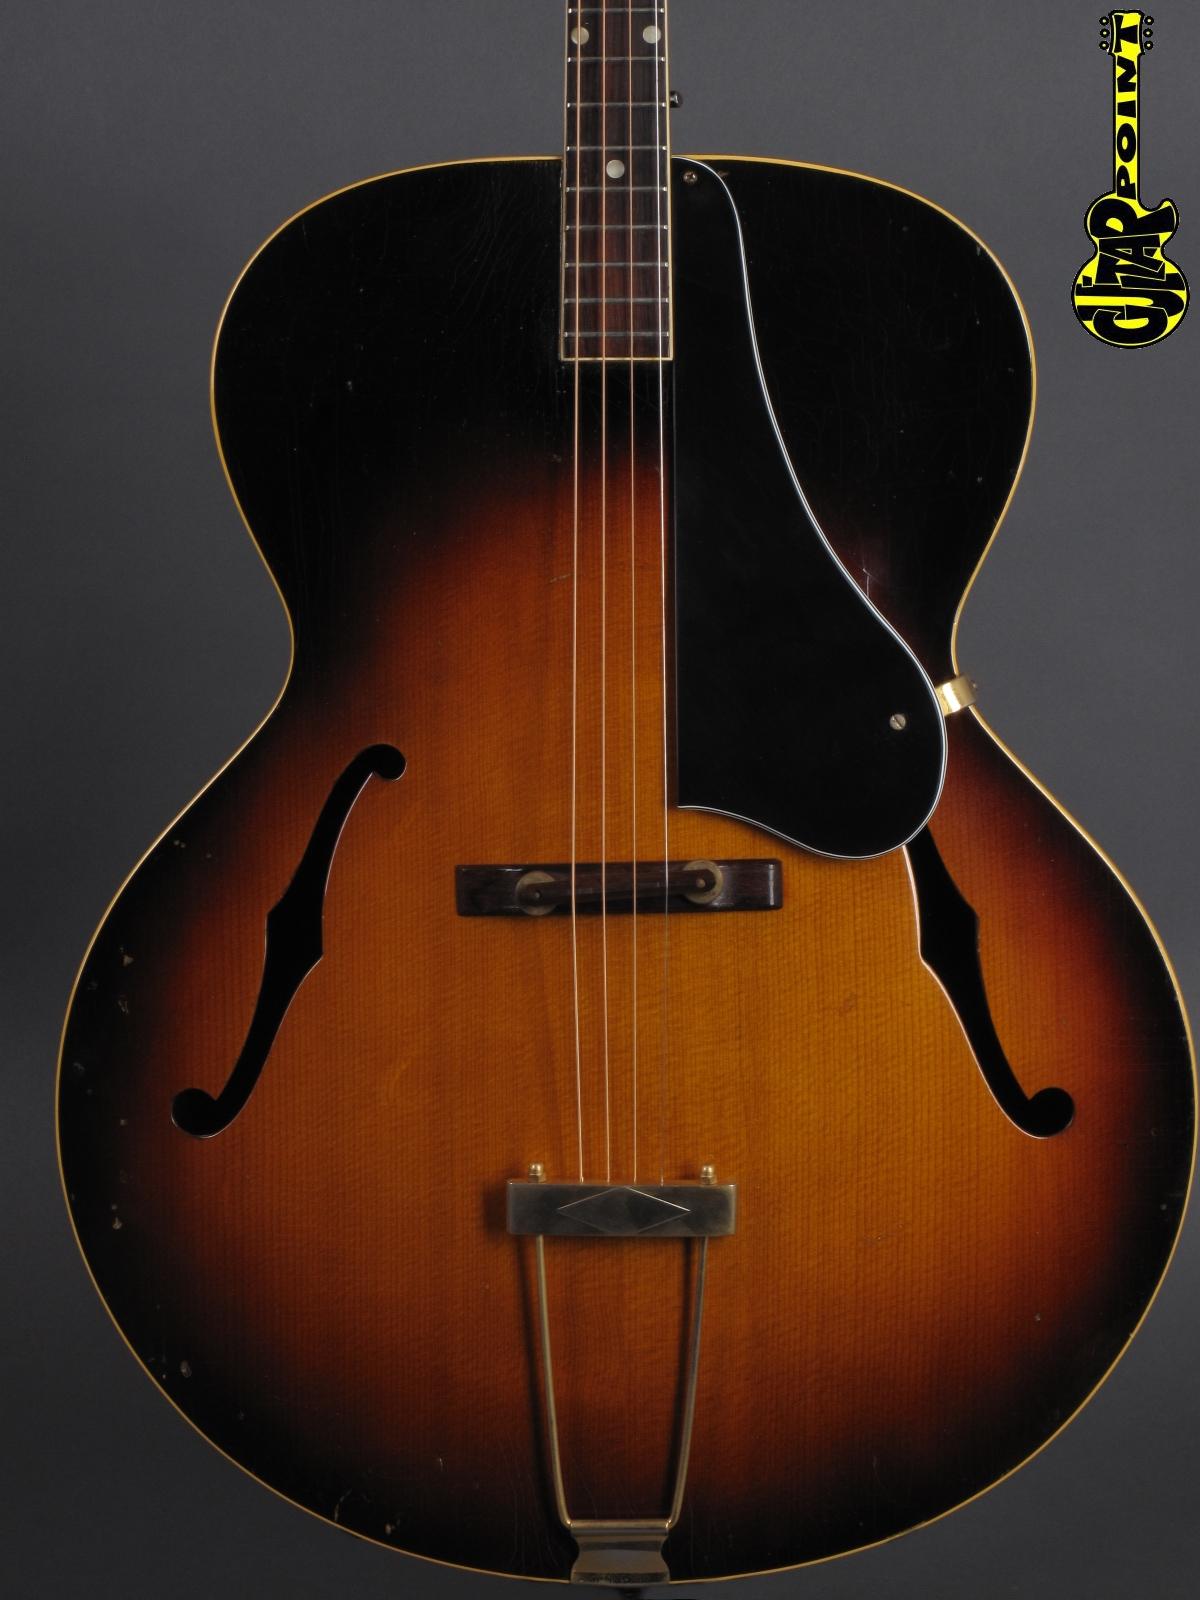 1956 Gibson TG-50 Tenor Guitar - Sunburst